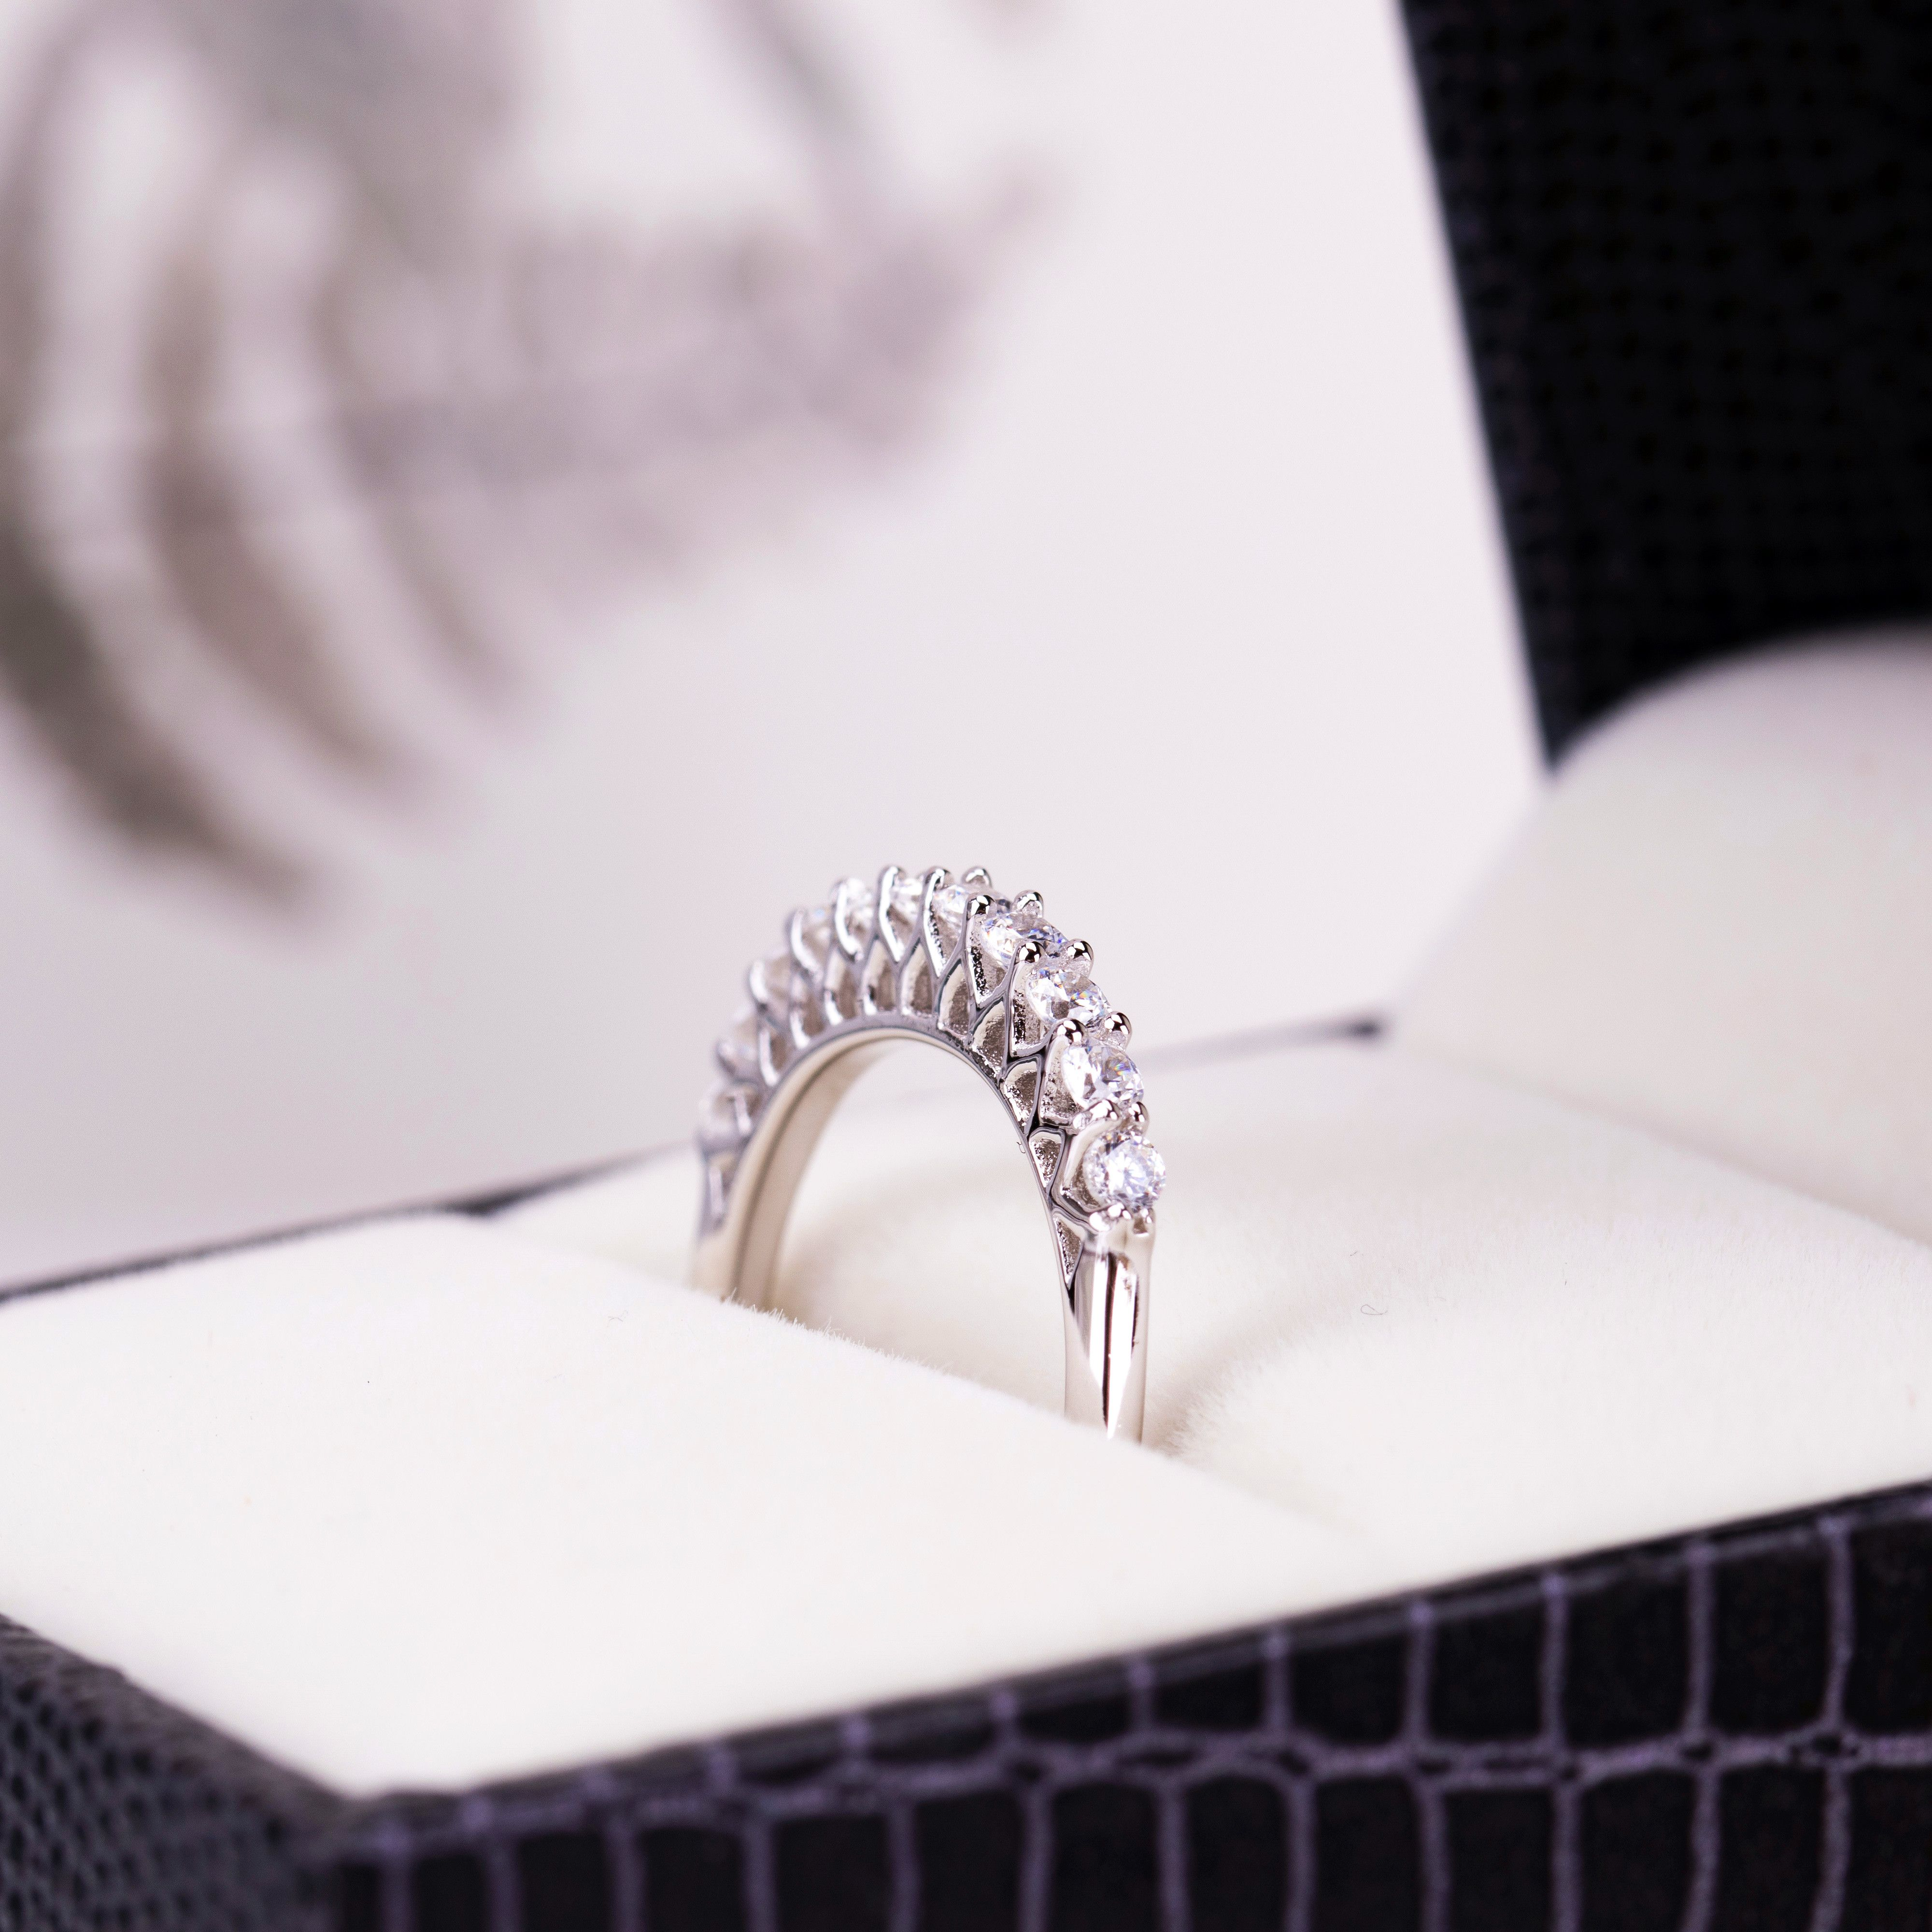 Sterling Silver Cz Eternity Rings For Women Sterling Silver Wedding Rings Silver Wedding Rings Jewelry